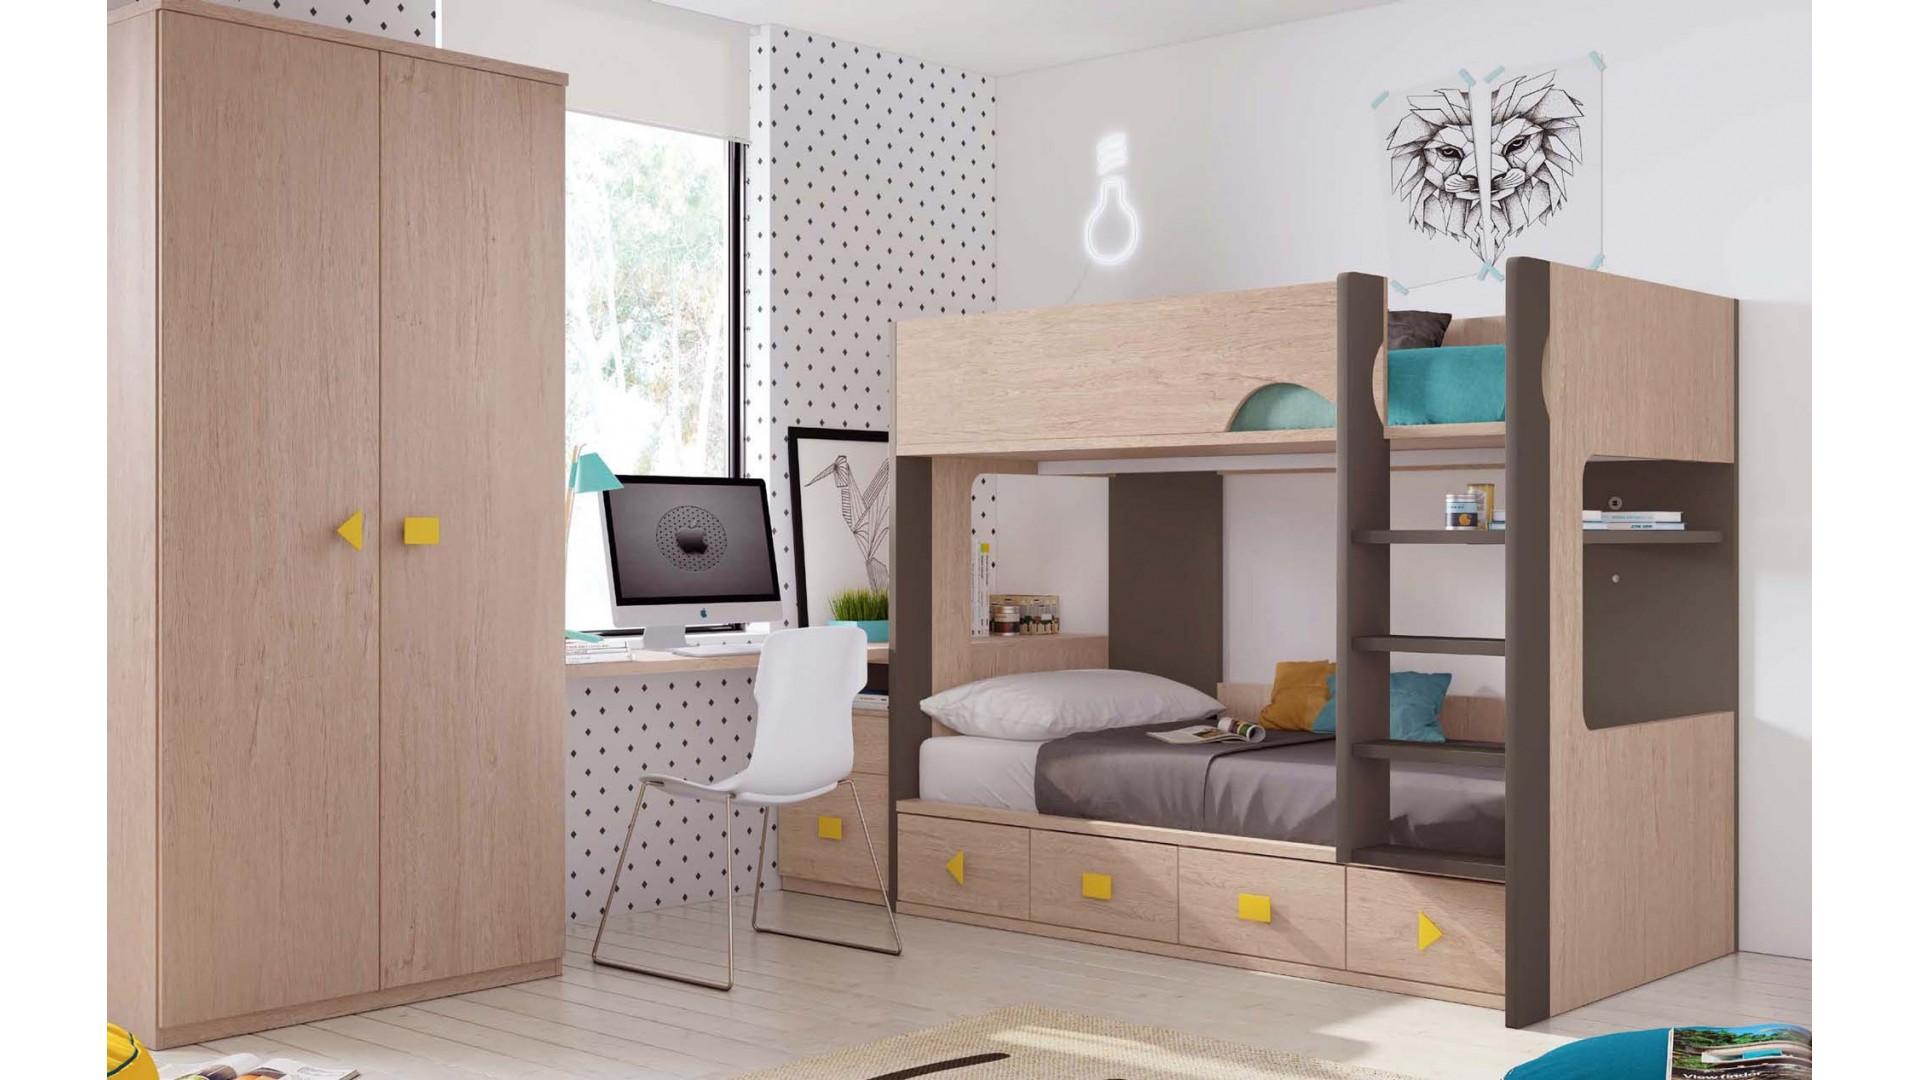 lit superpose fille avec armoire personnalisable f204 glicerio